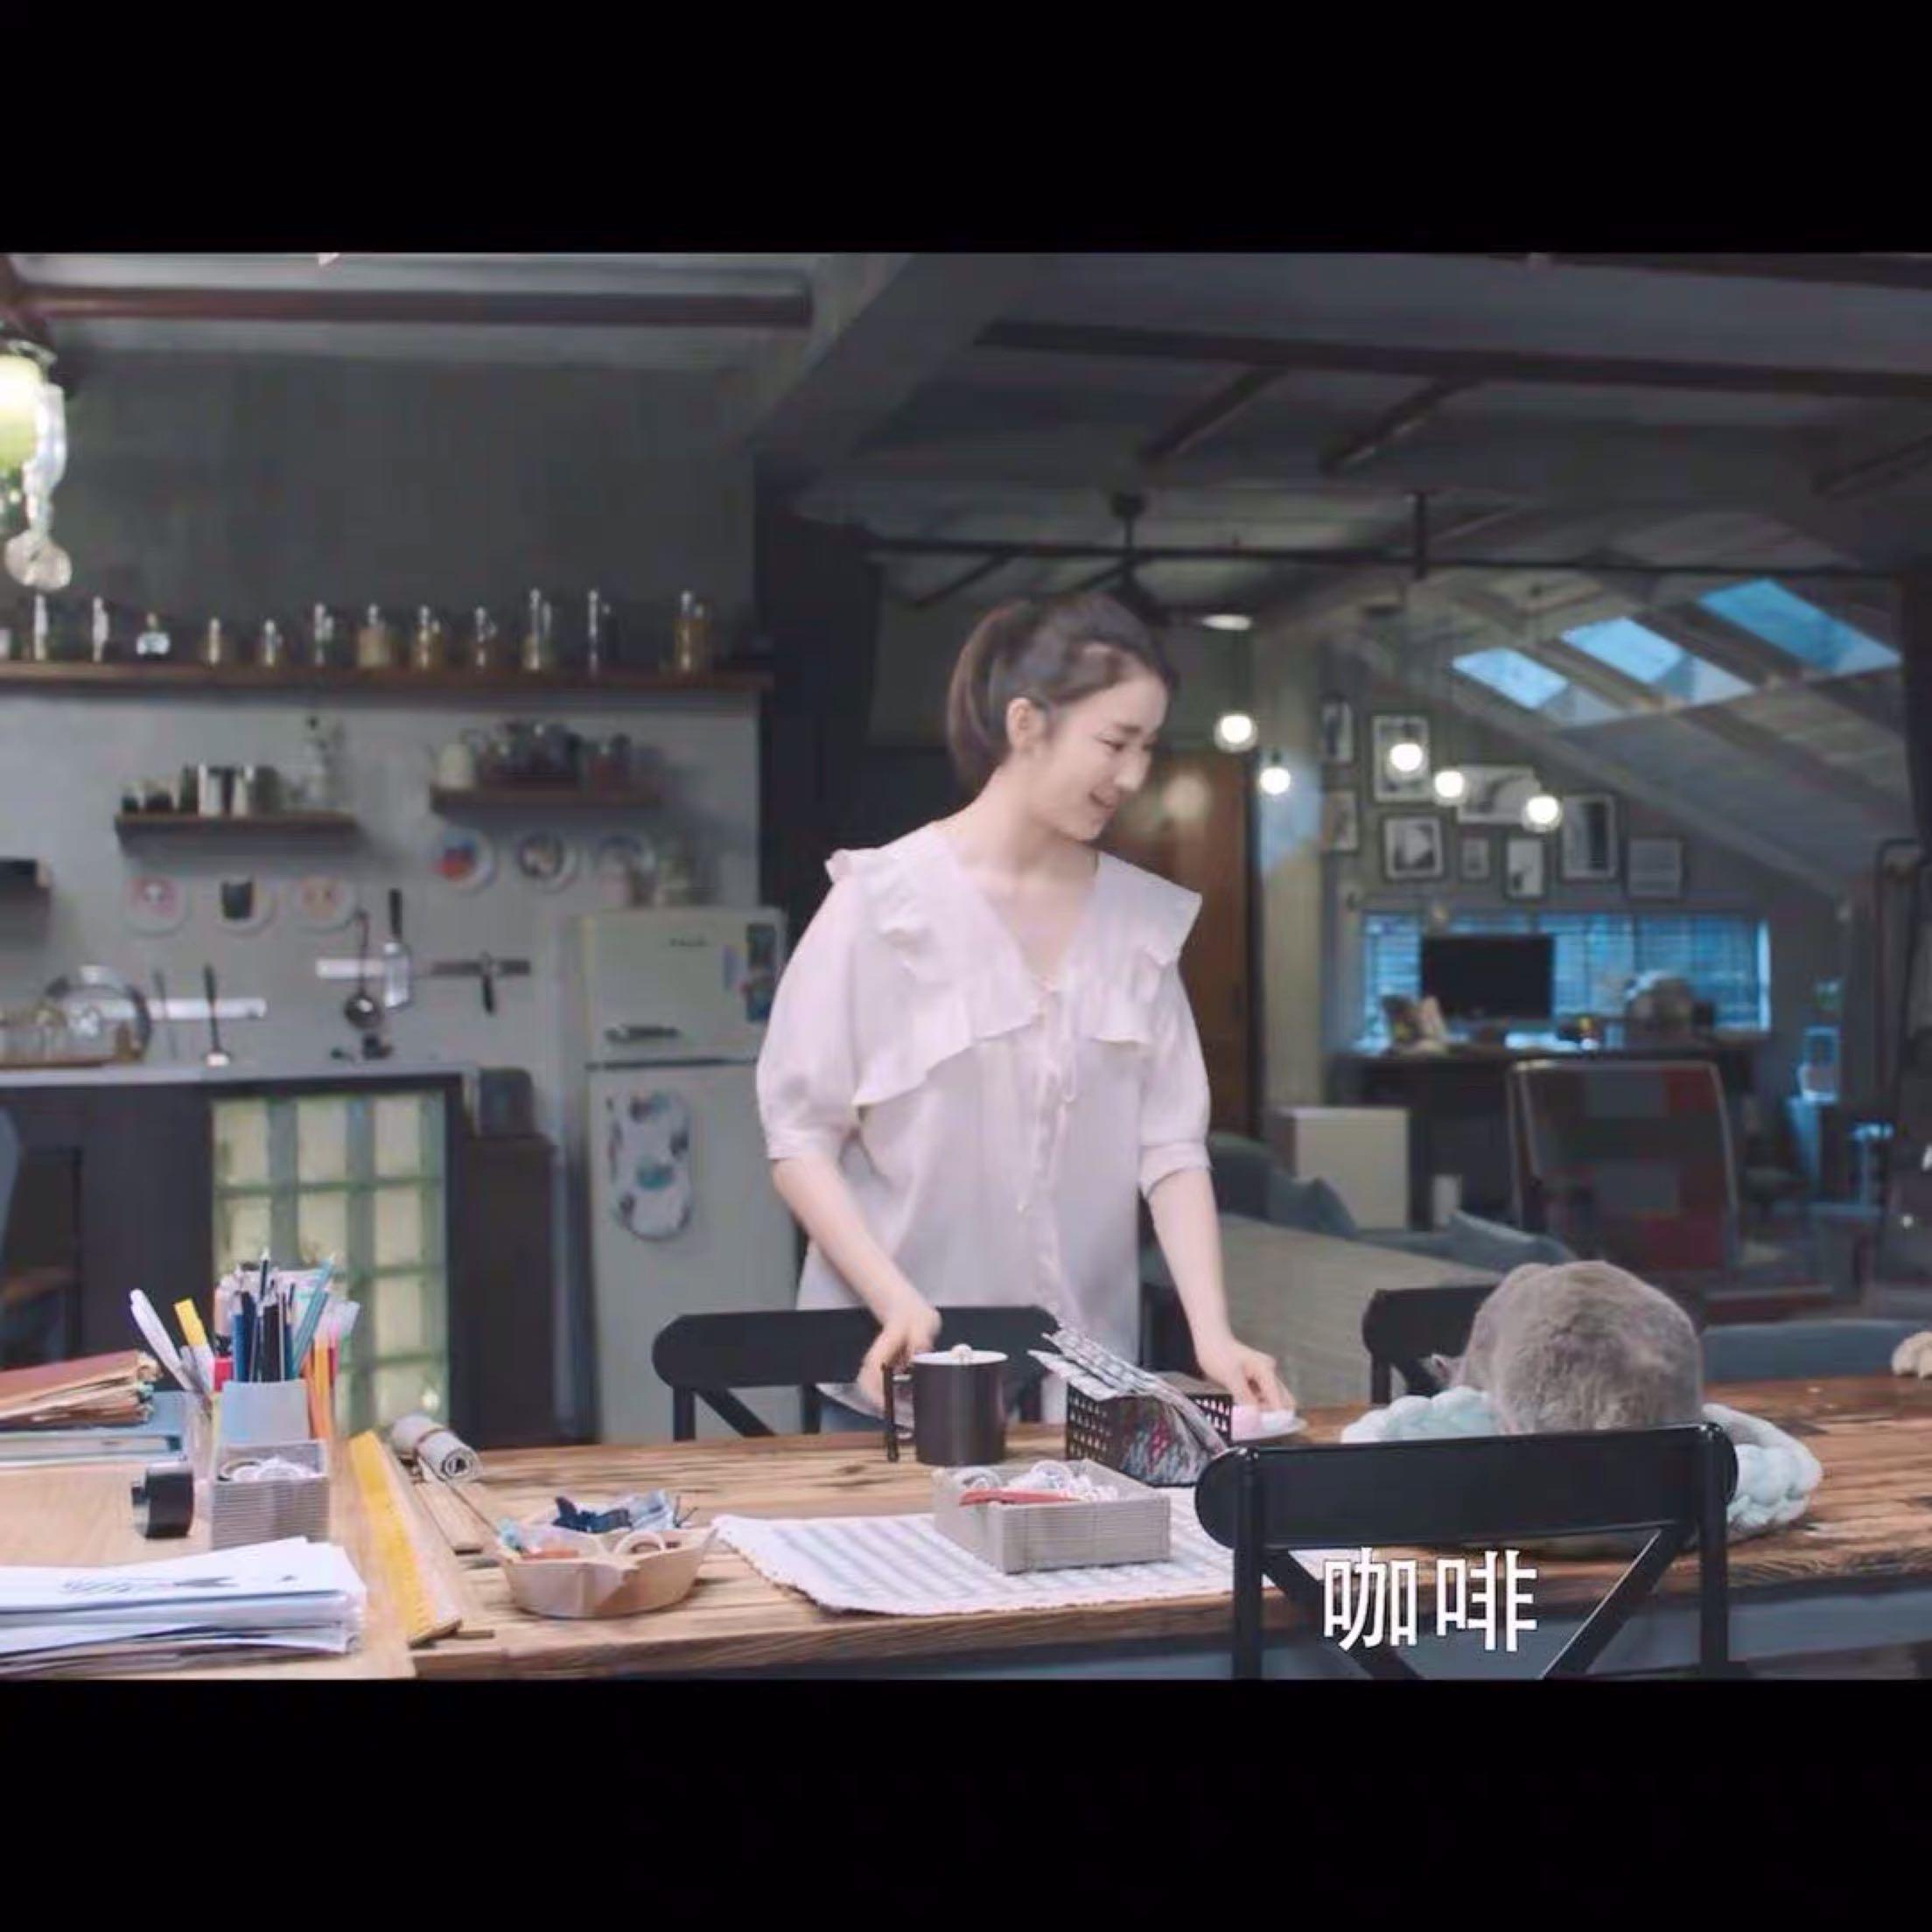 Earth blushed, Zhang Lingyi, Wang Chen, the same womens fresh summer clothes, all kinds of matching ruffles, V-neck lace up chiffon shirt